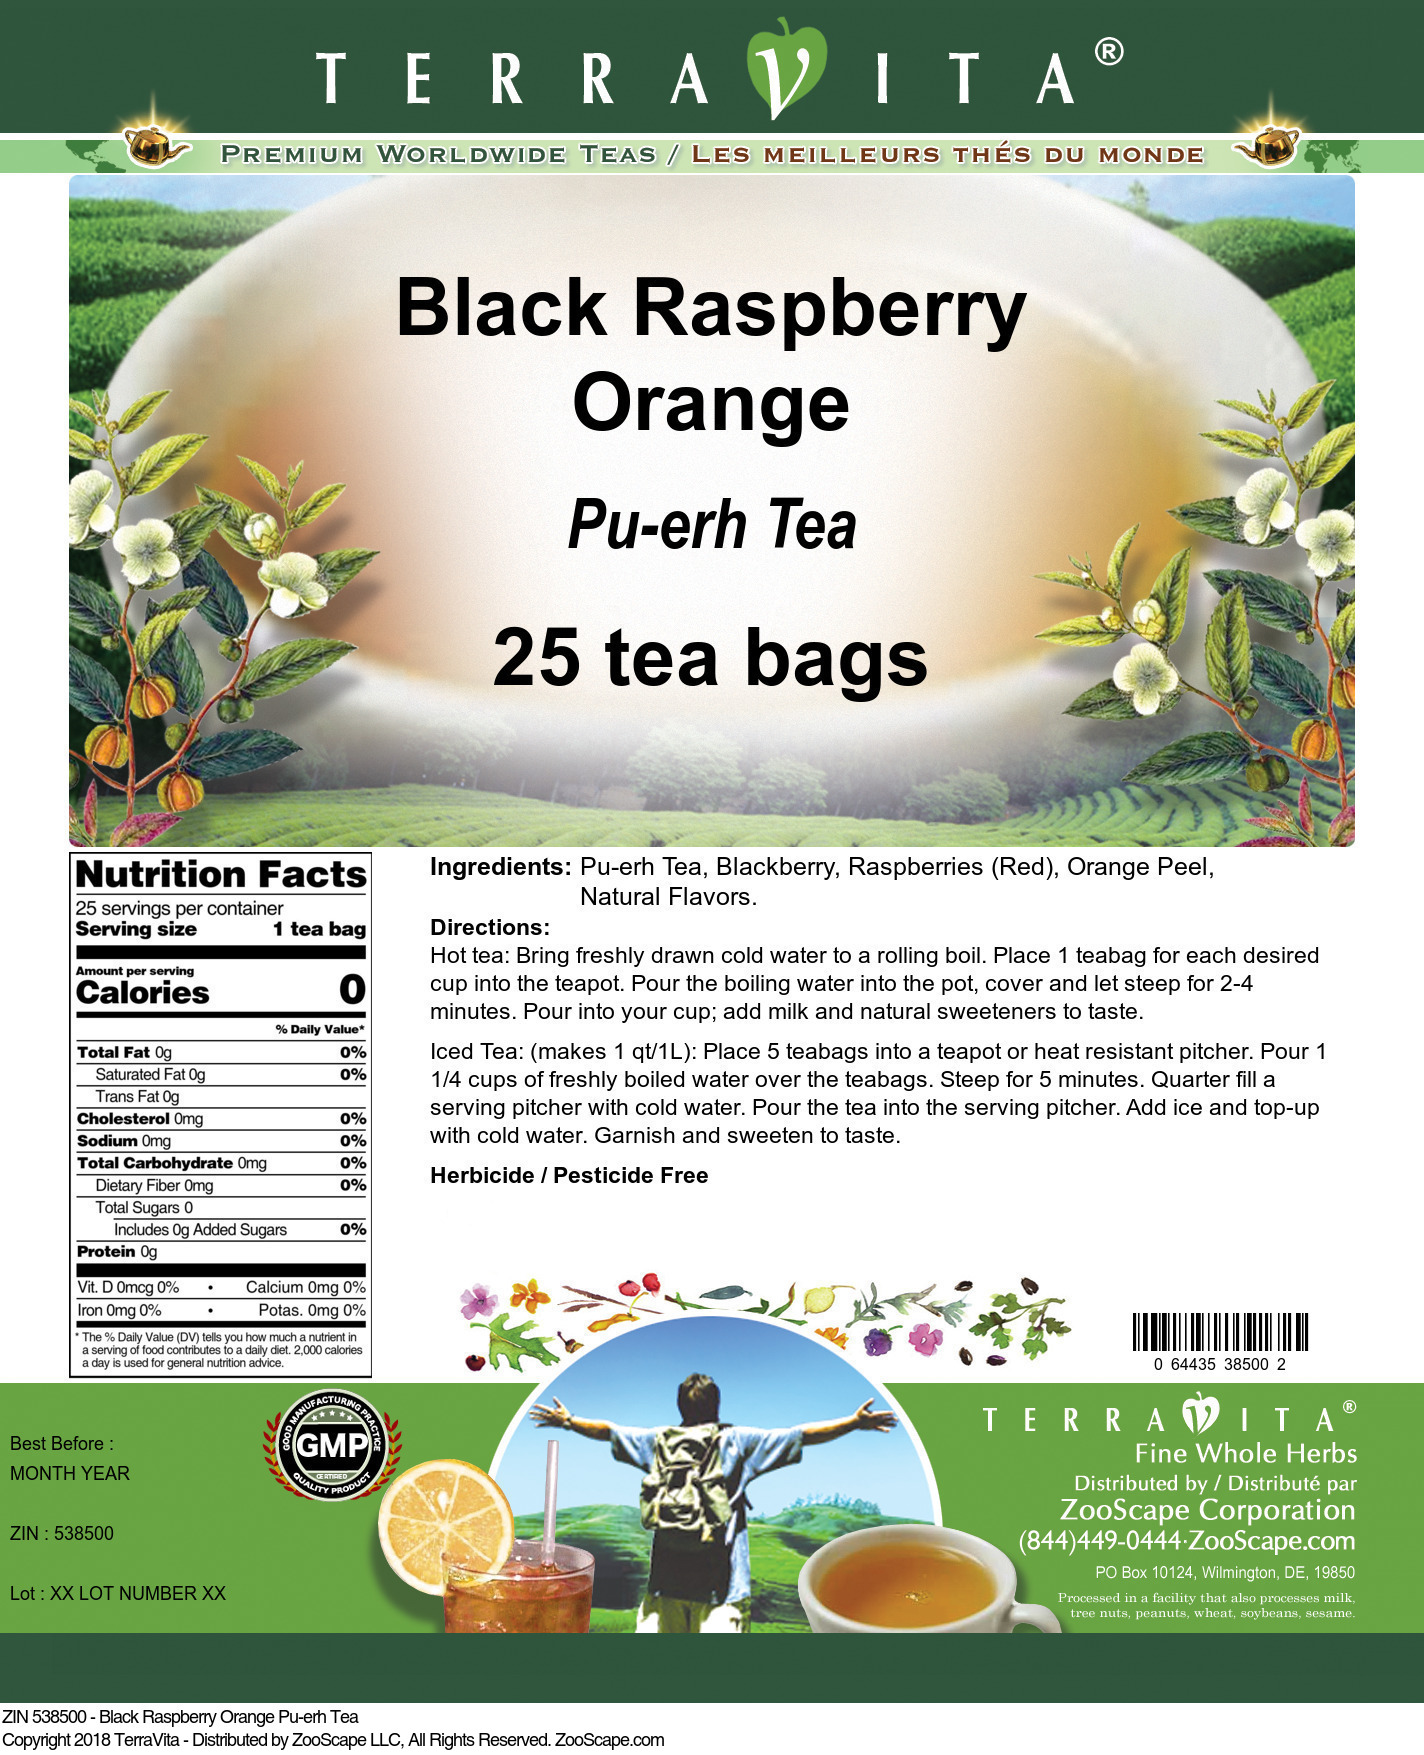 Black Raspberry Orange Pu-erh Tea